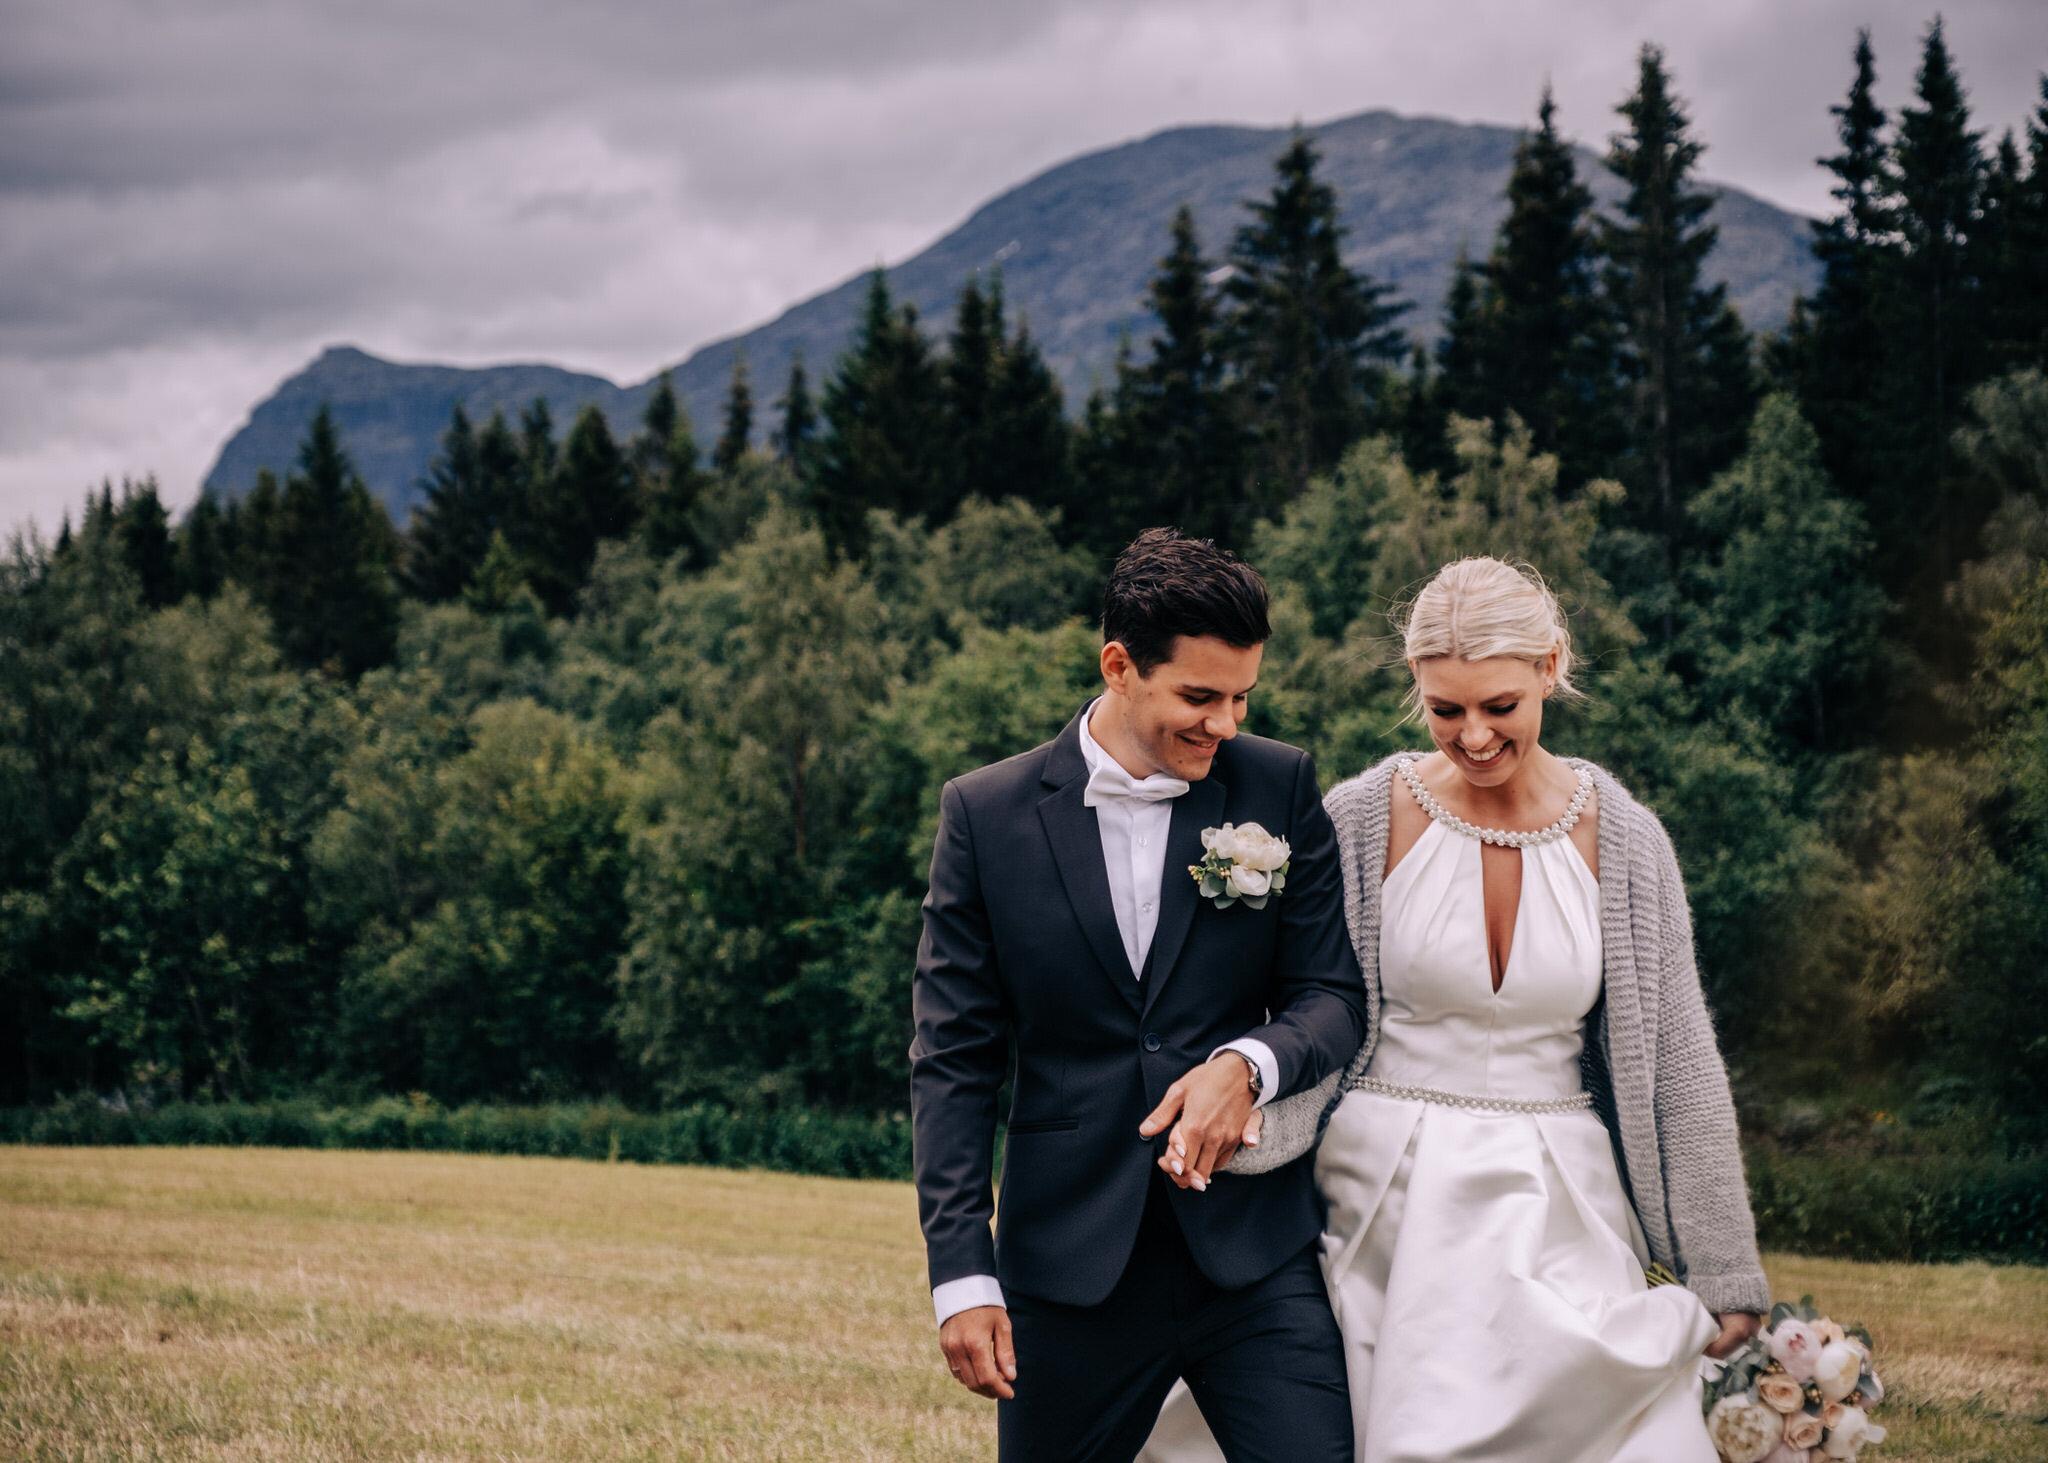 fotograf_bryllupsfotograf_oslo_bryllup_skaarsnuten_hemsedal-235.JPG